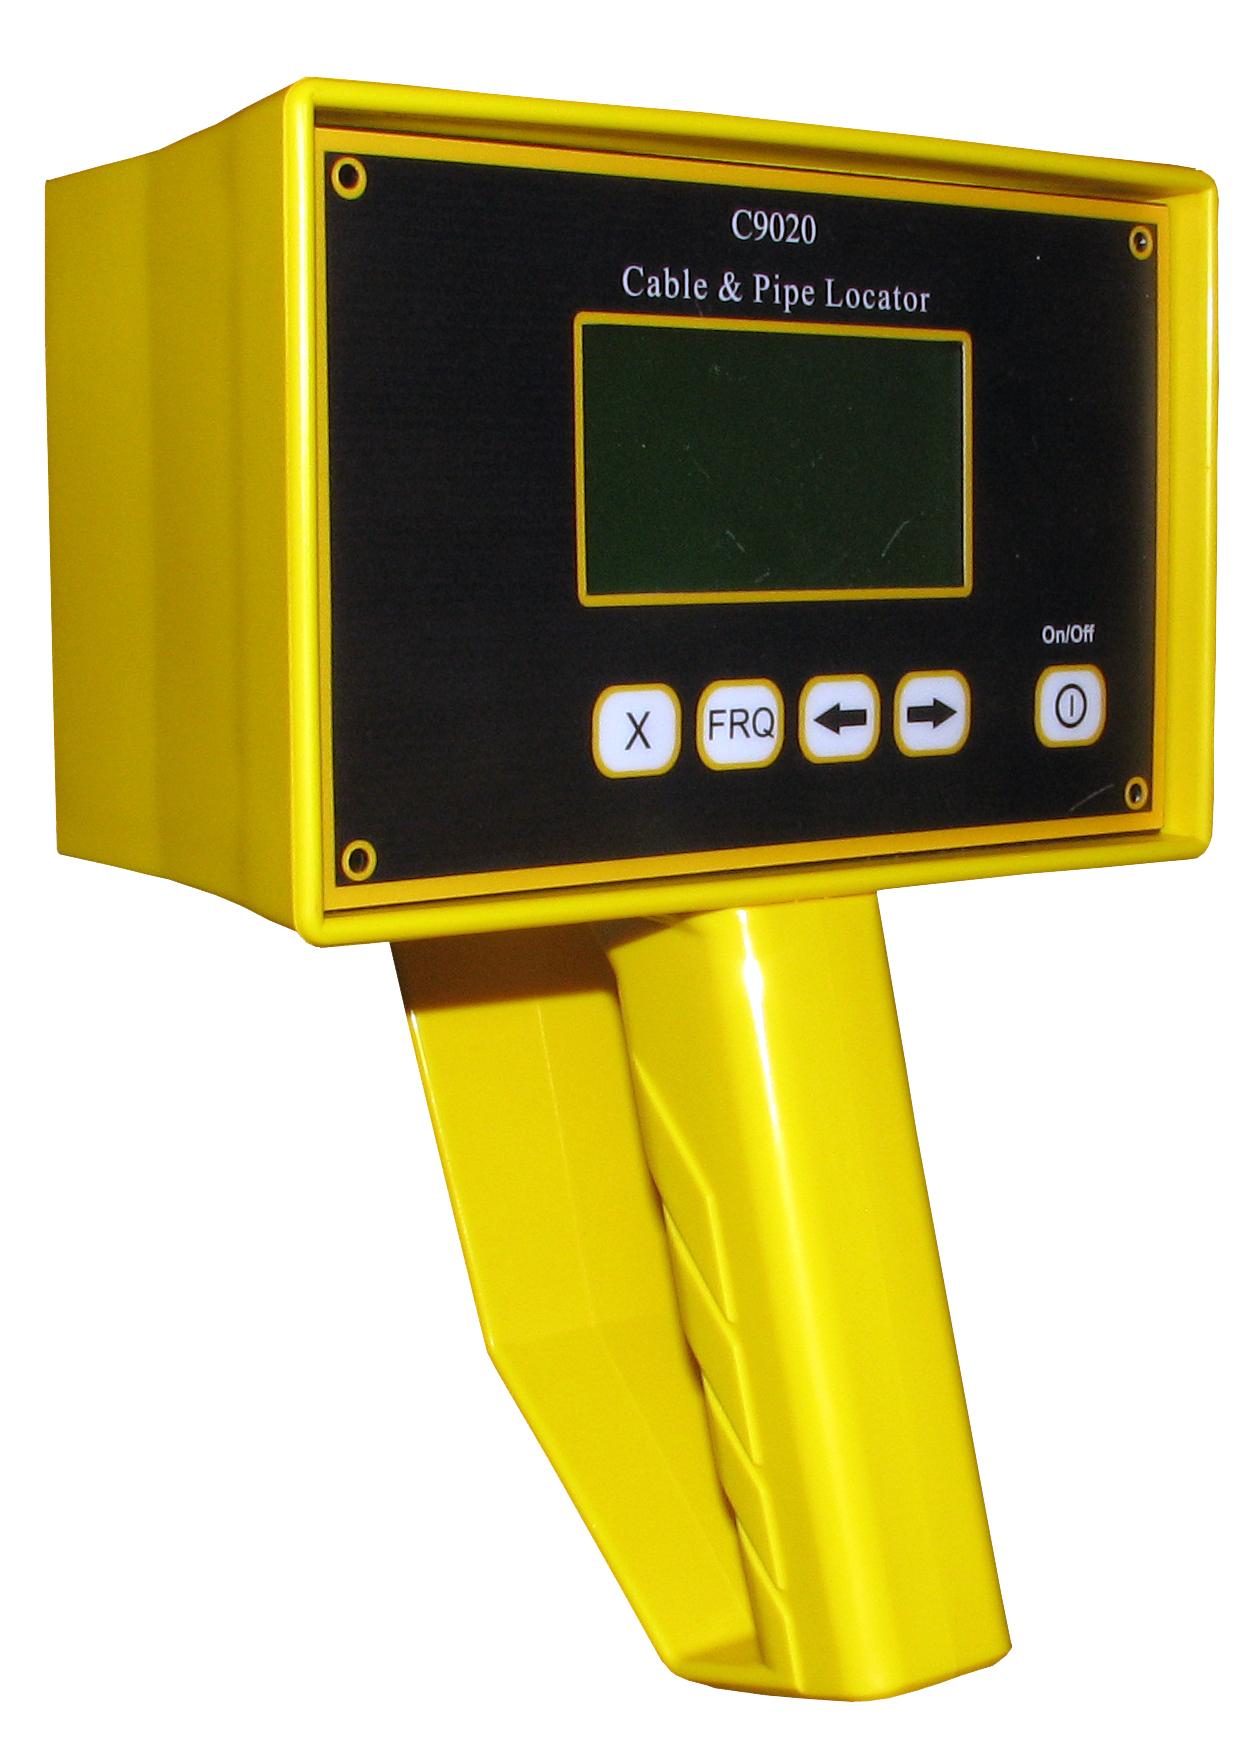 Coax Fault Locator : Cable fault locator